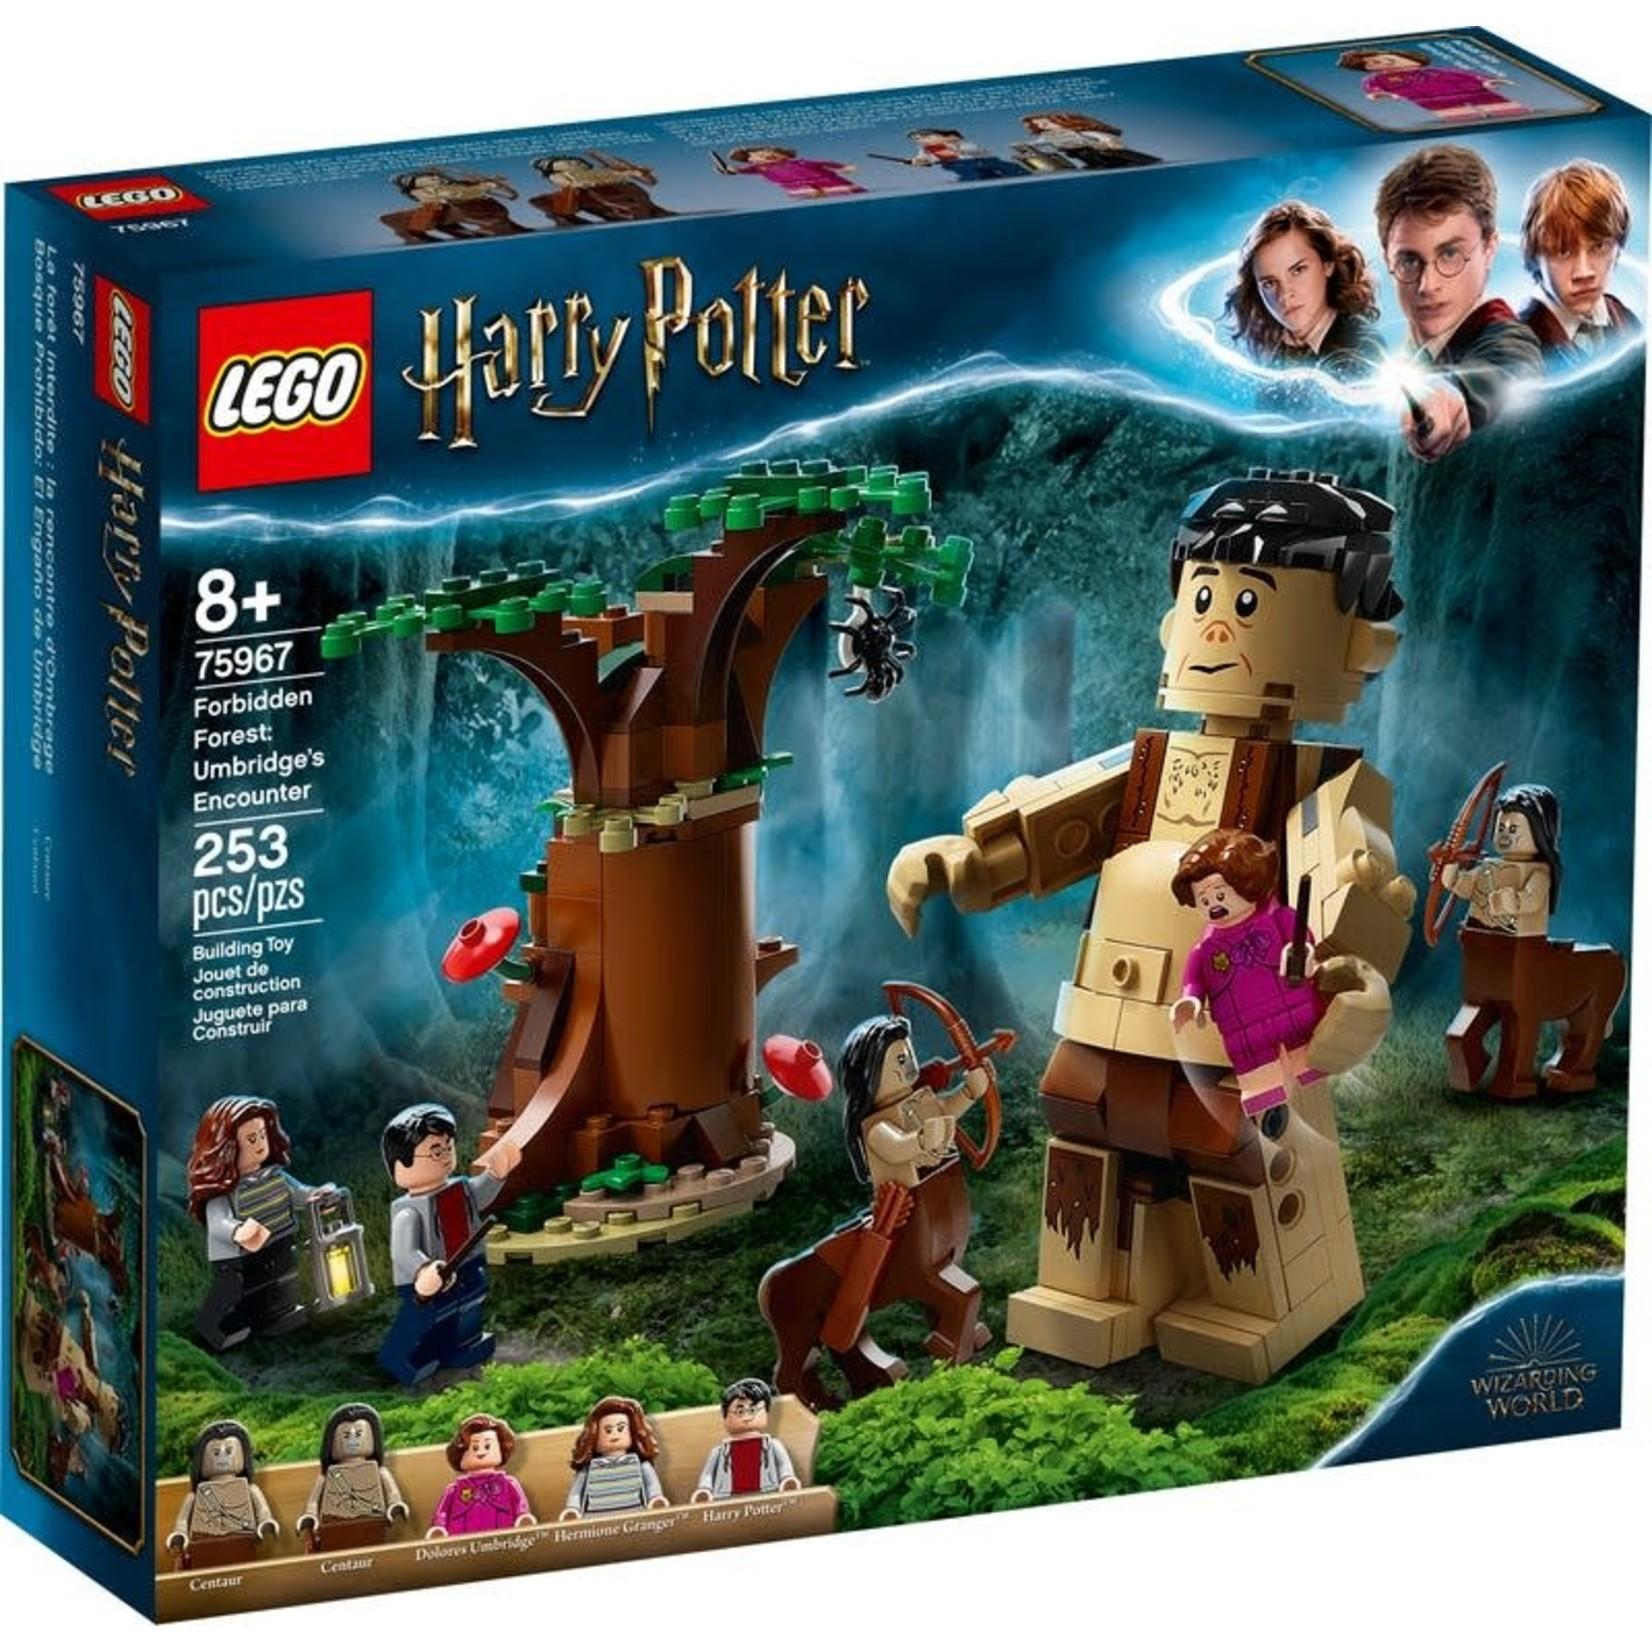 LEGO Lego Harry Potter Forbidden Forest Umbridge's Encounter